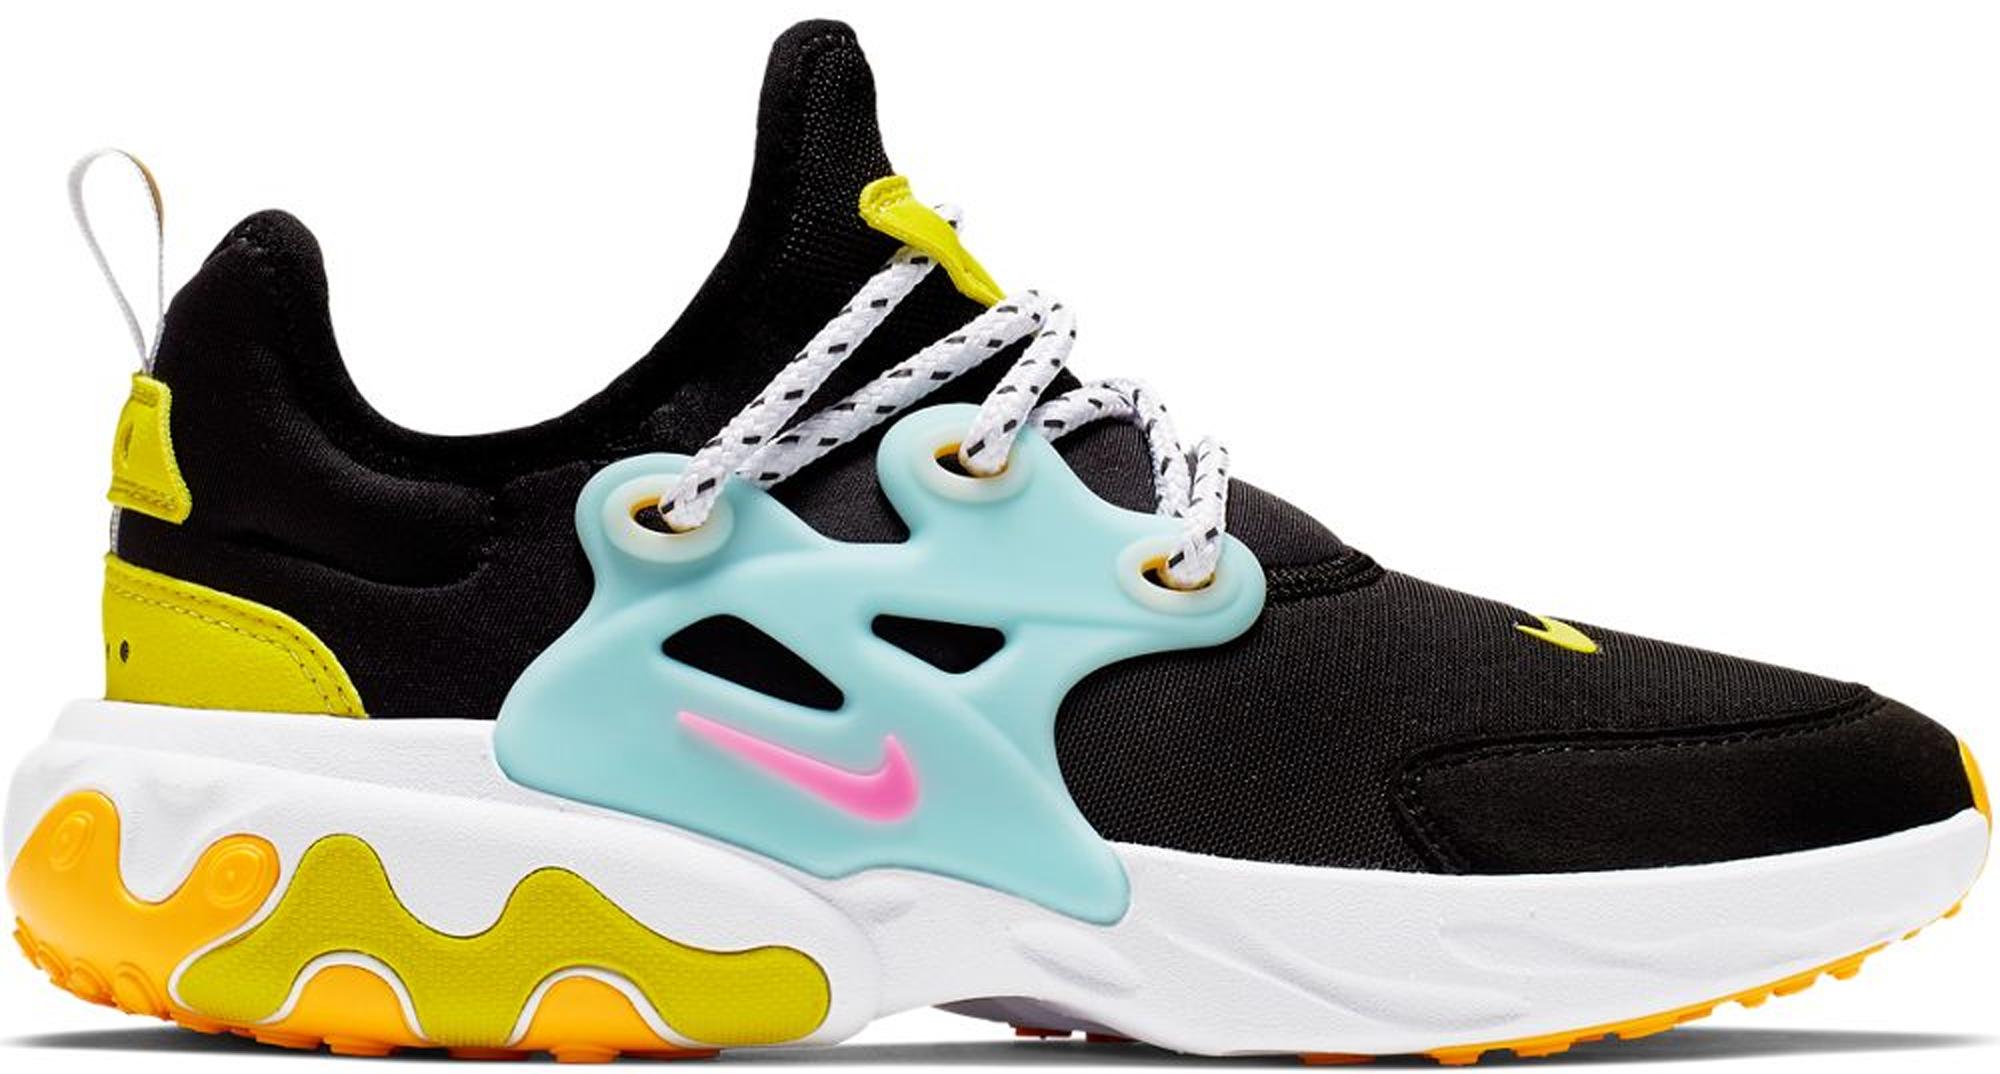 Nike React Presto Black Teal Tint Cyber (GS)